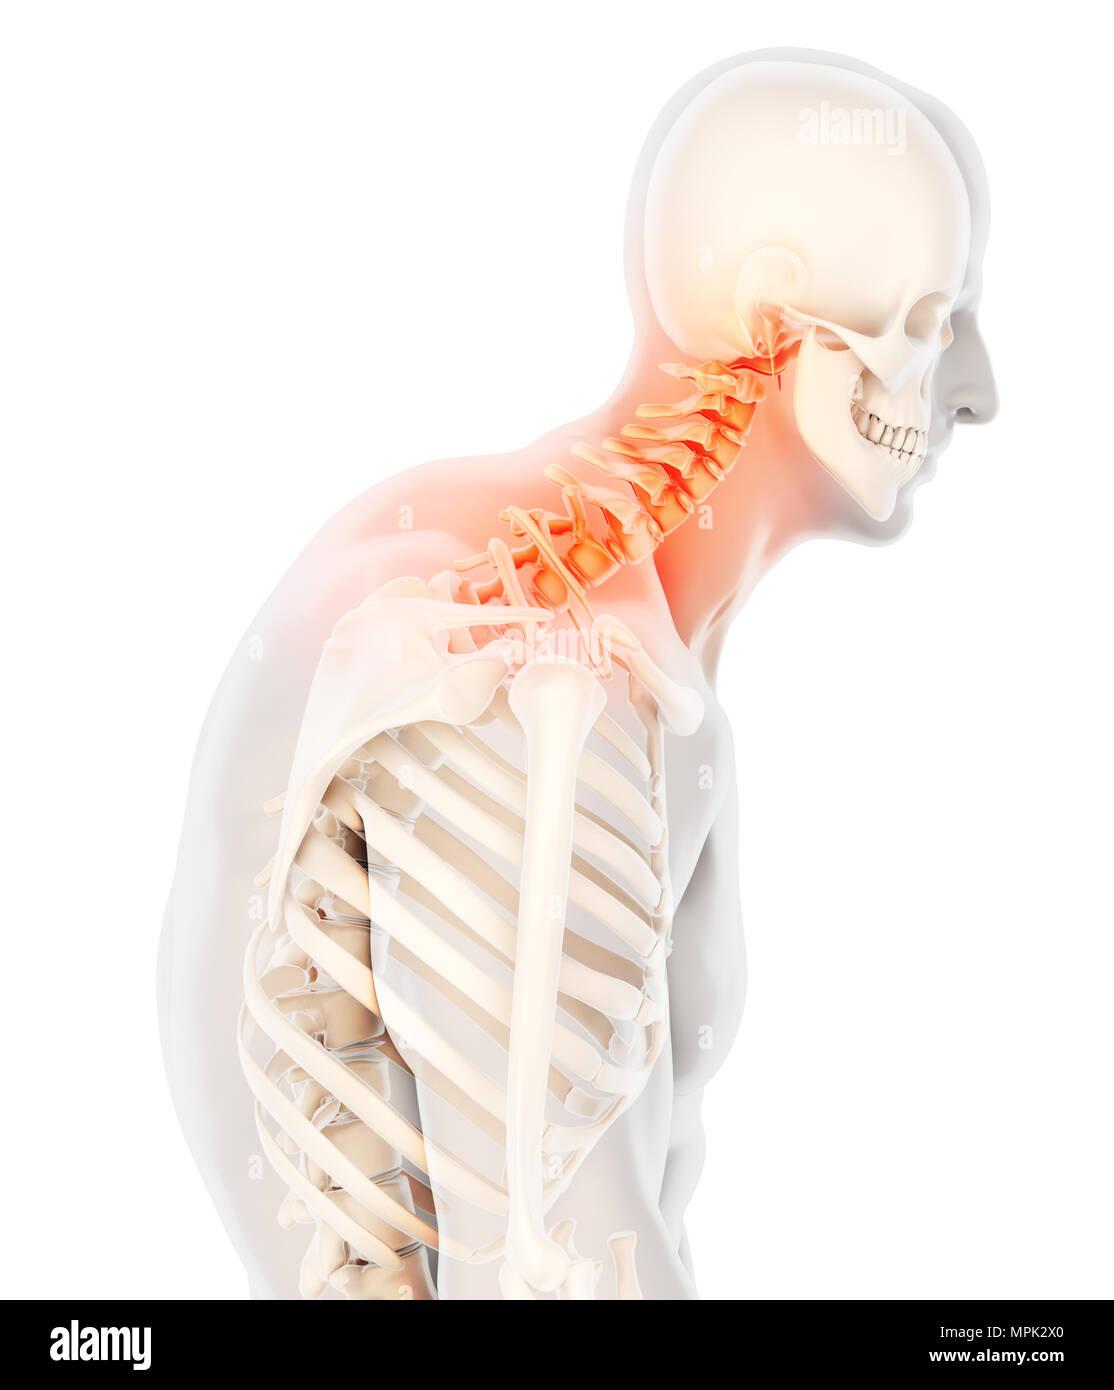 3d Illustration Neck Painful Cervical Spine Skeleton X Ray